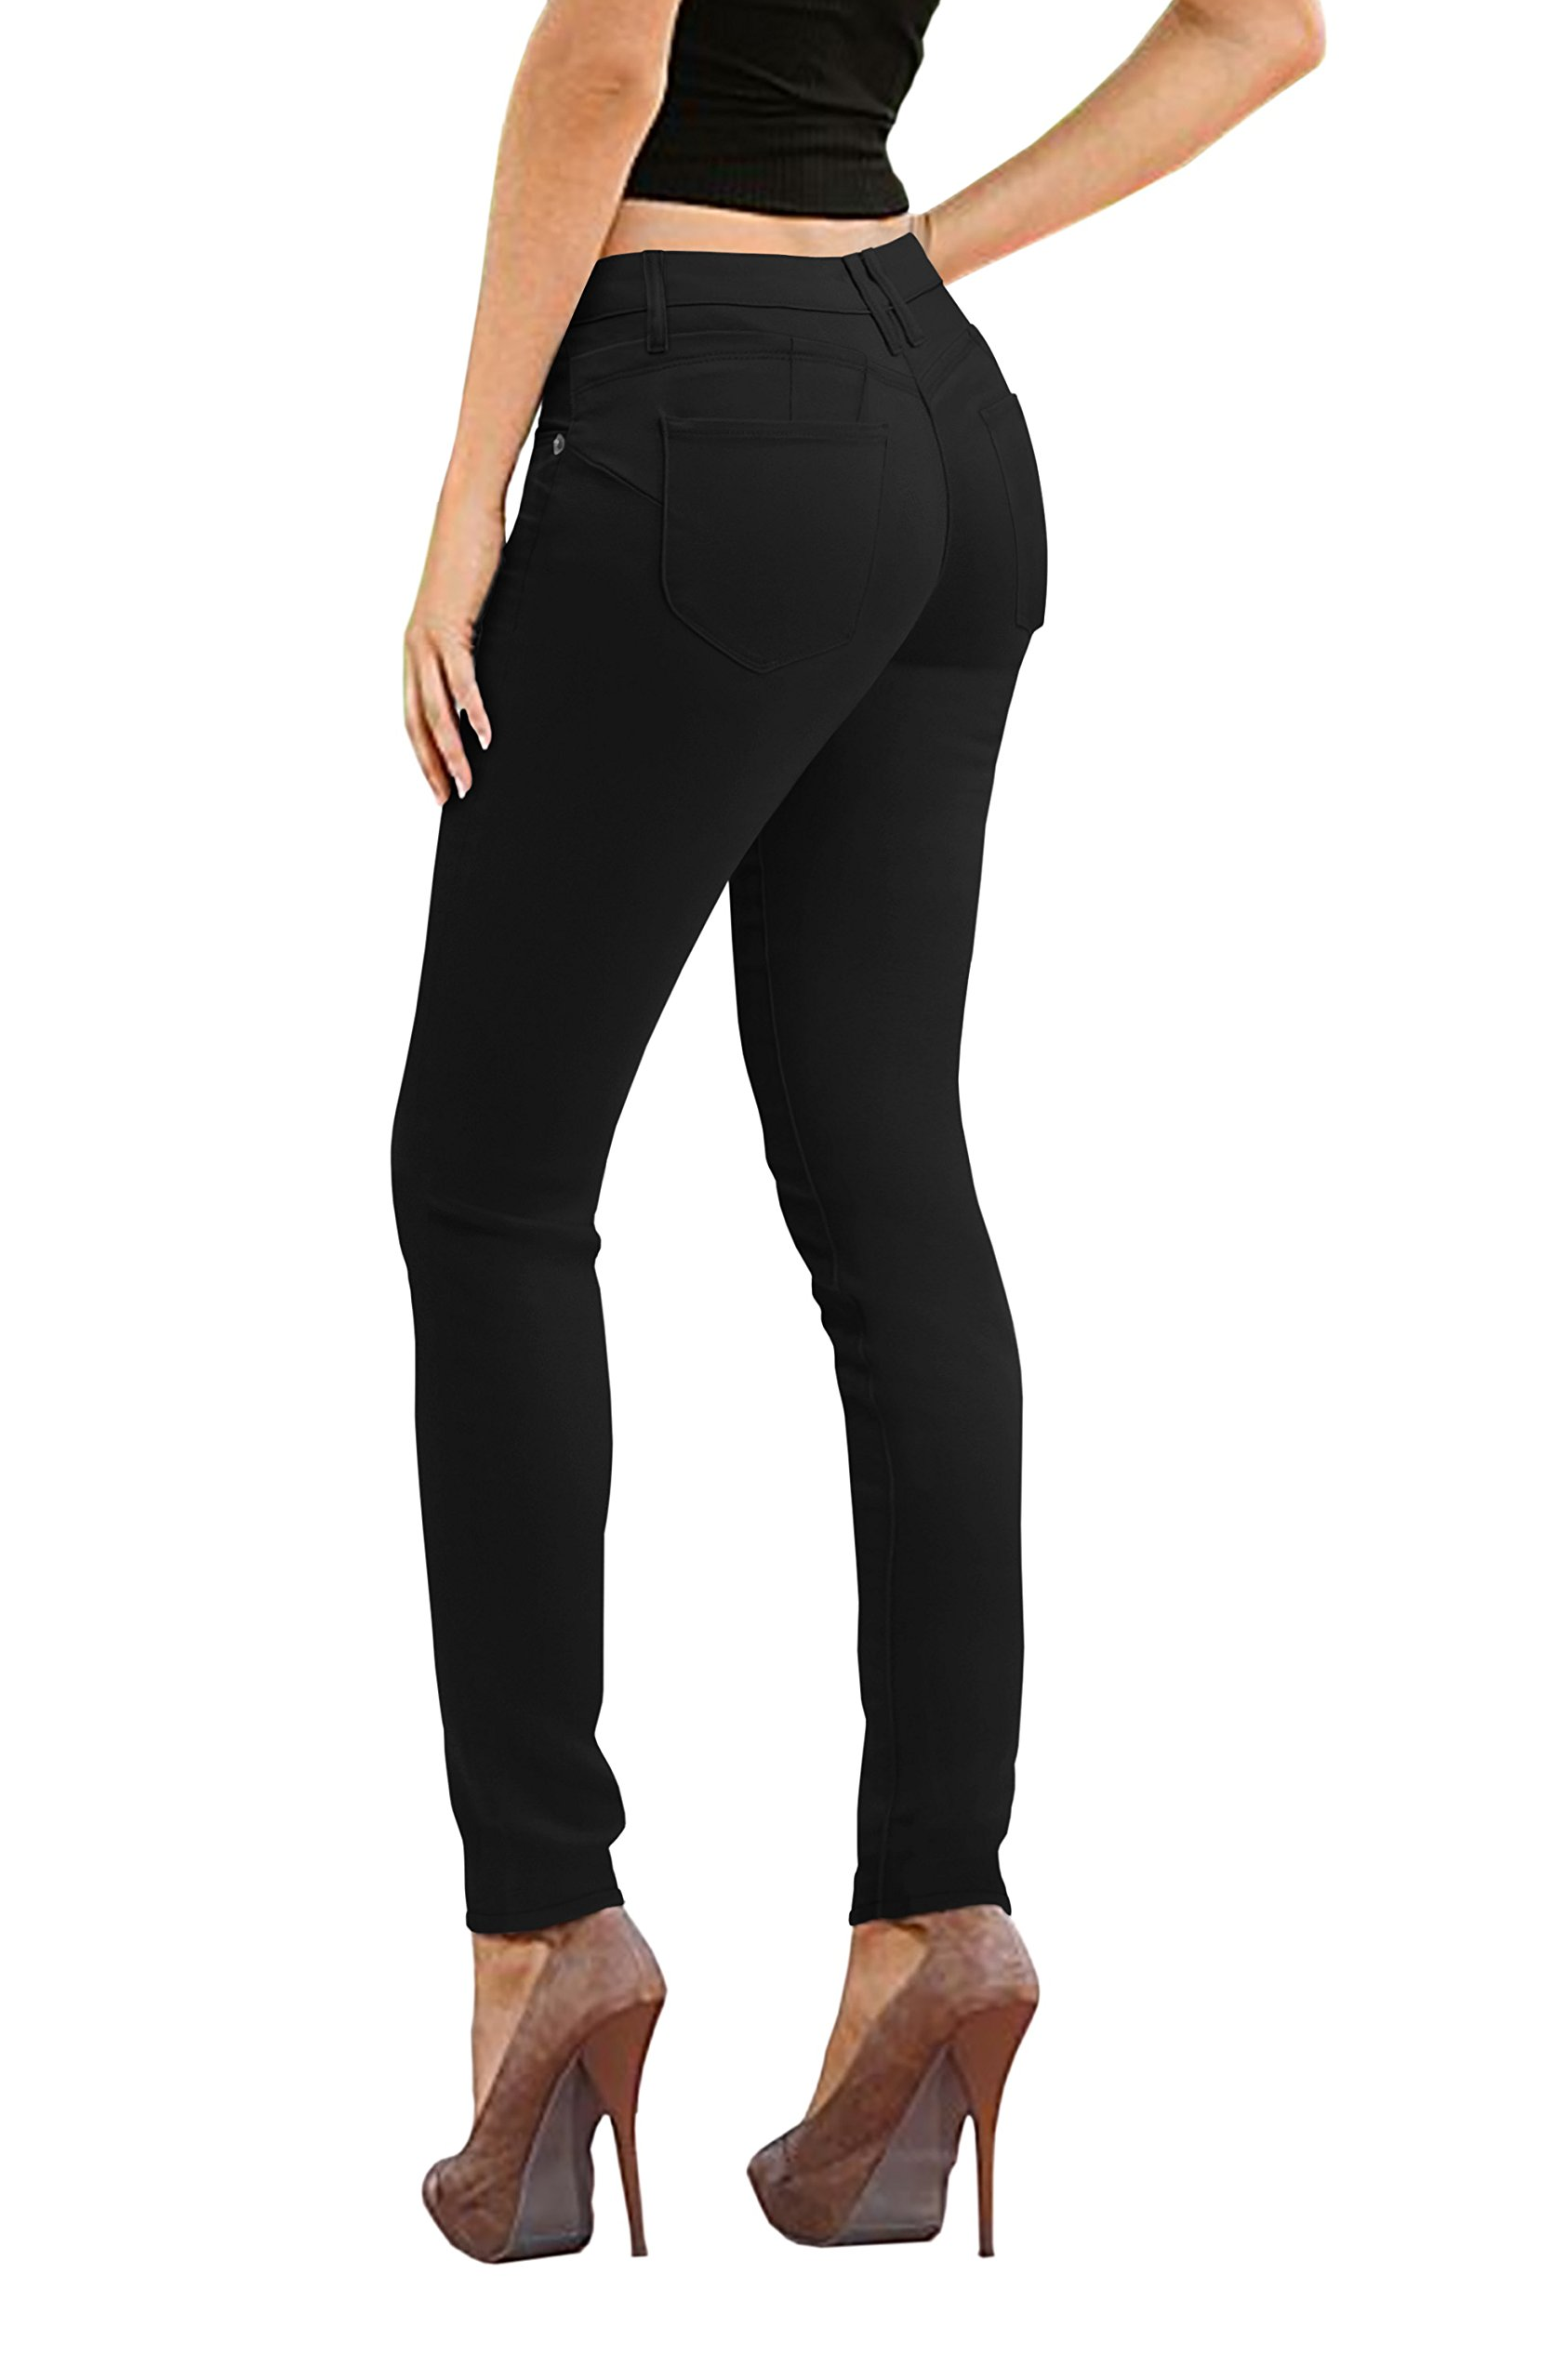 Women's Butt Lift Stretch Denim Jeans-P37375SK-Black-3 by HyBrid & Company